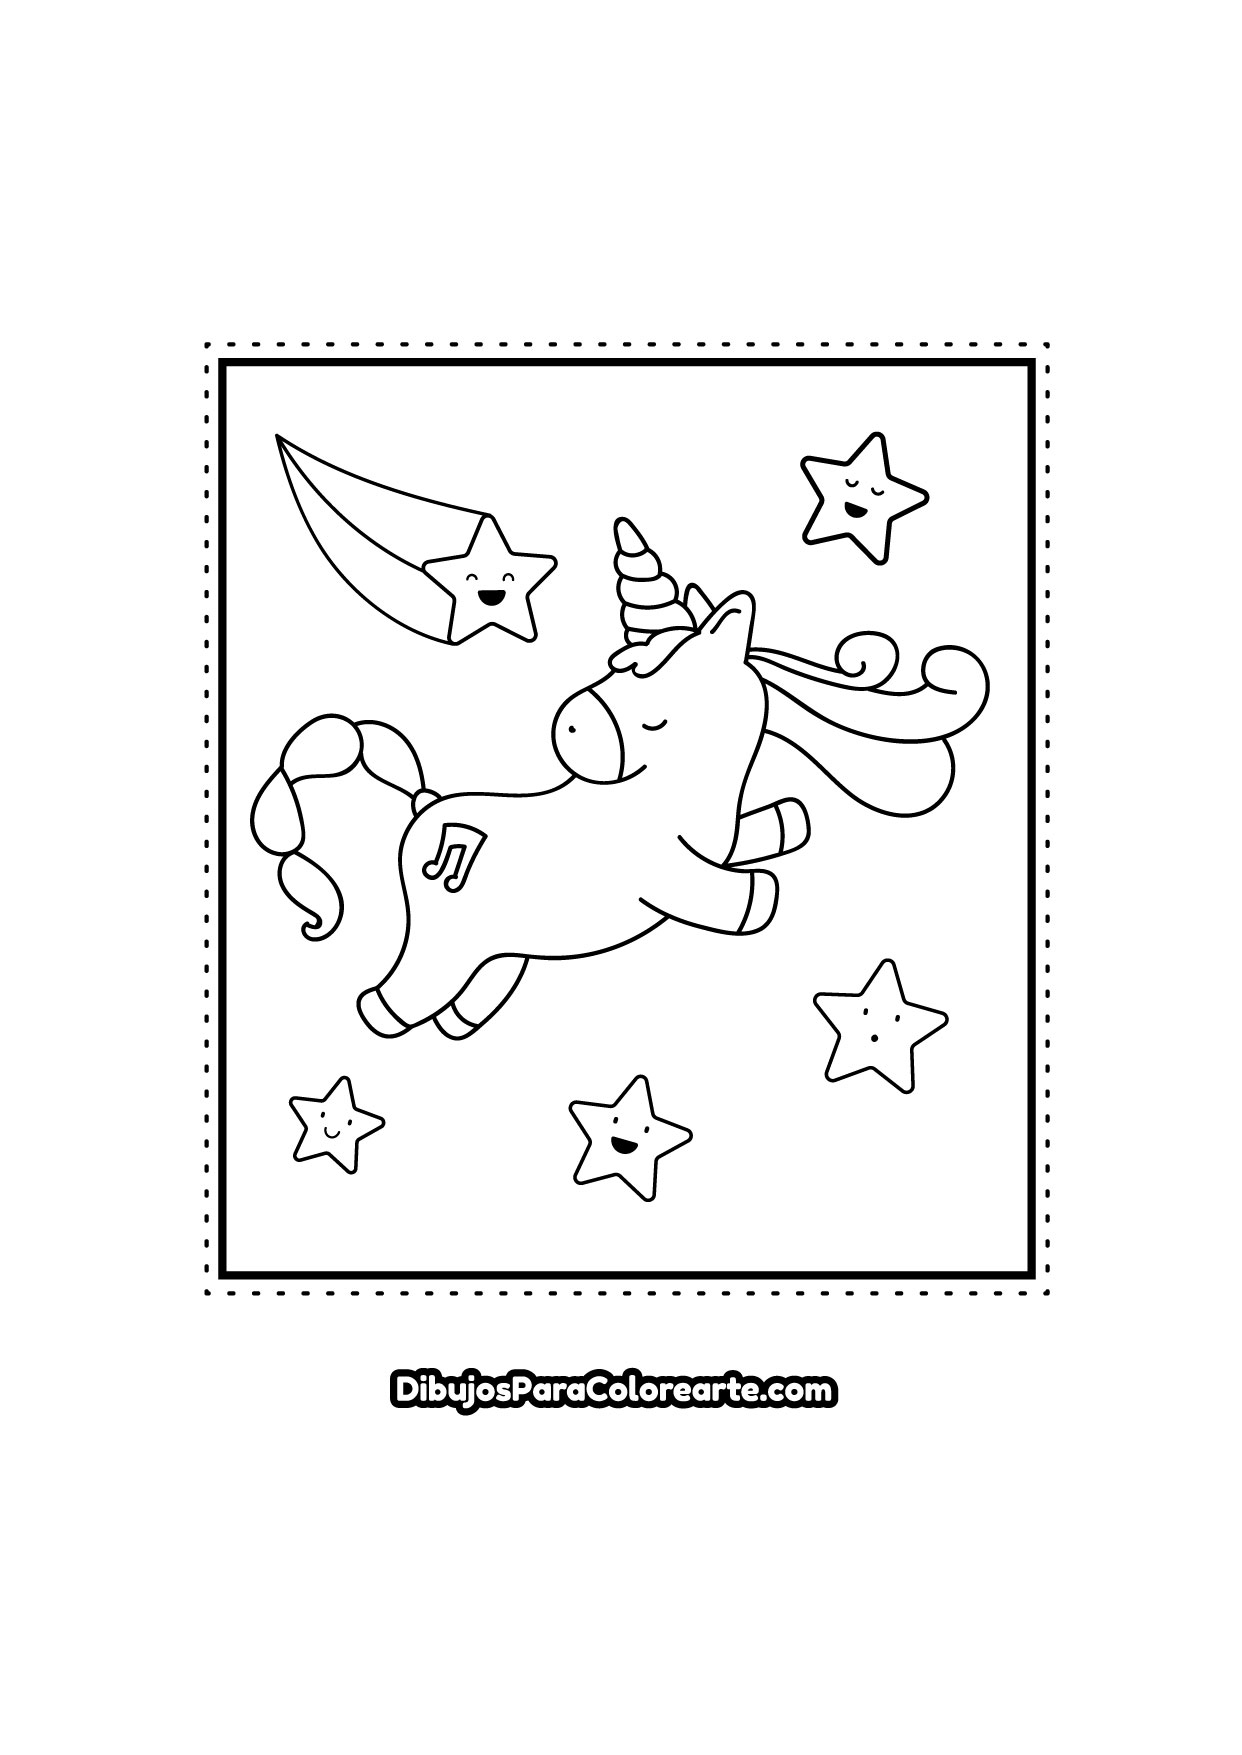 Unicornio Para Colorear Online O Imprimir